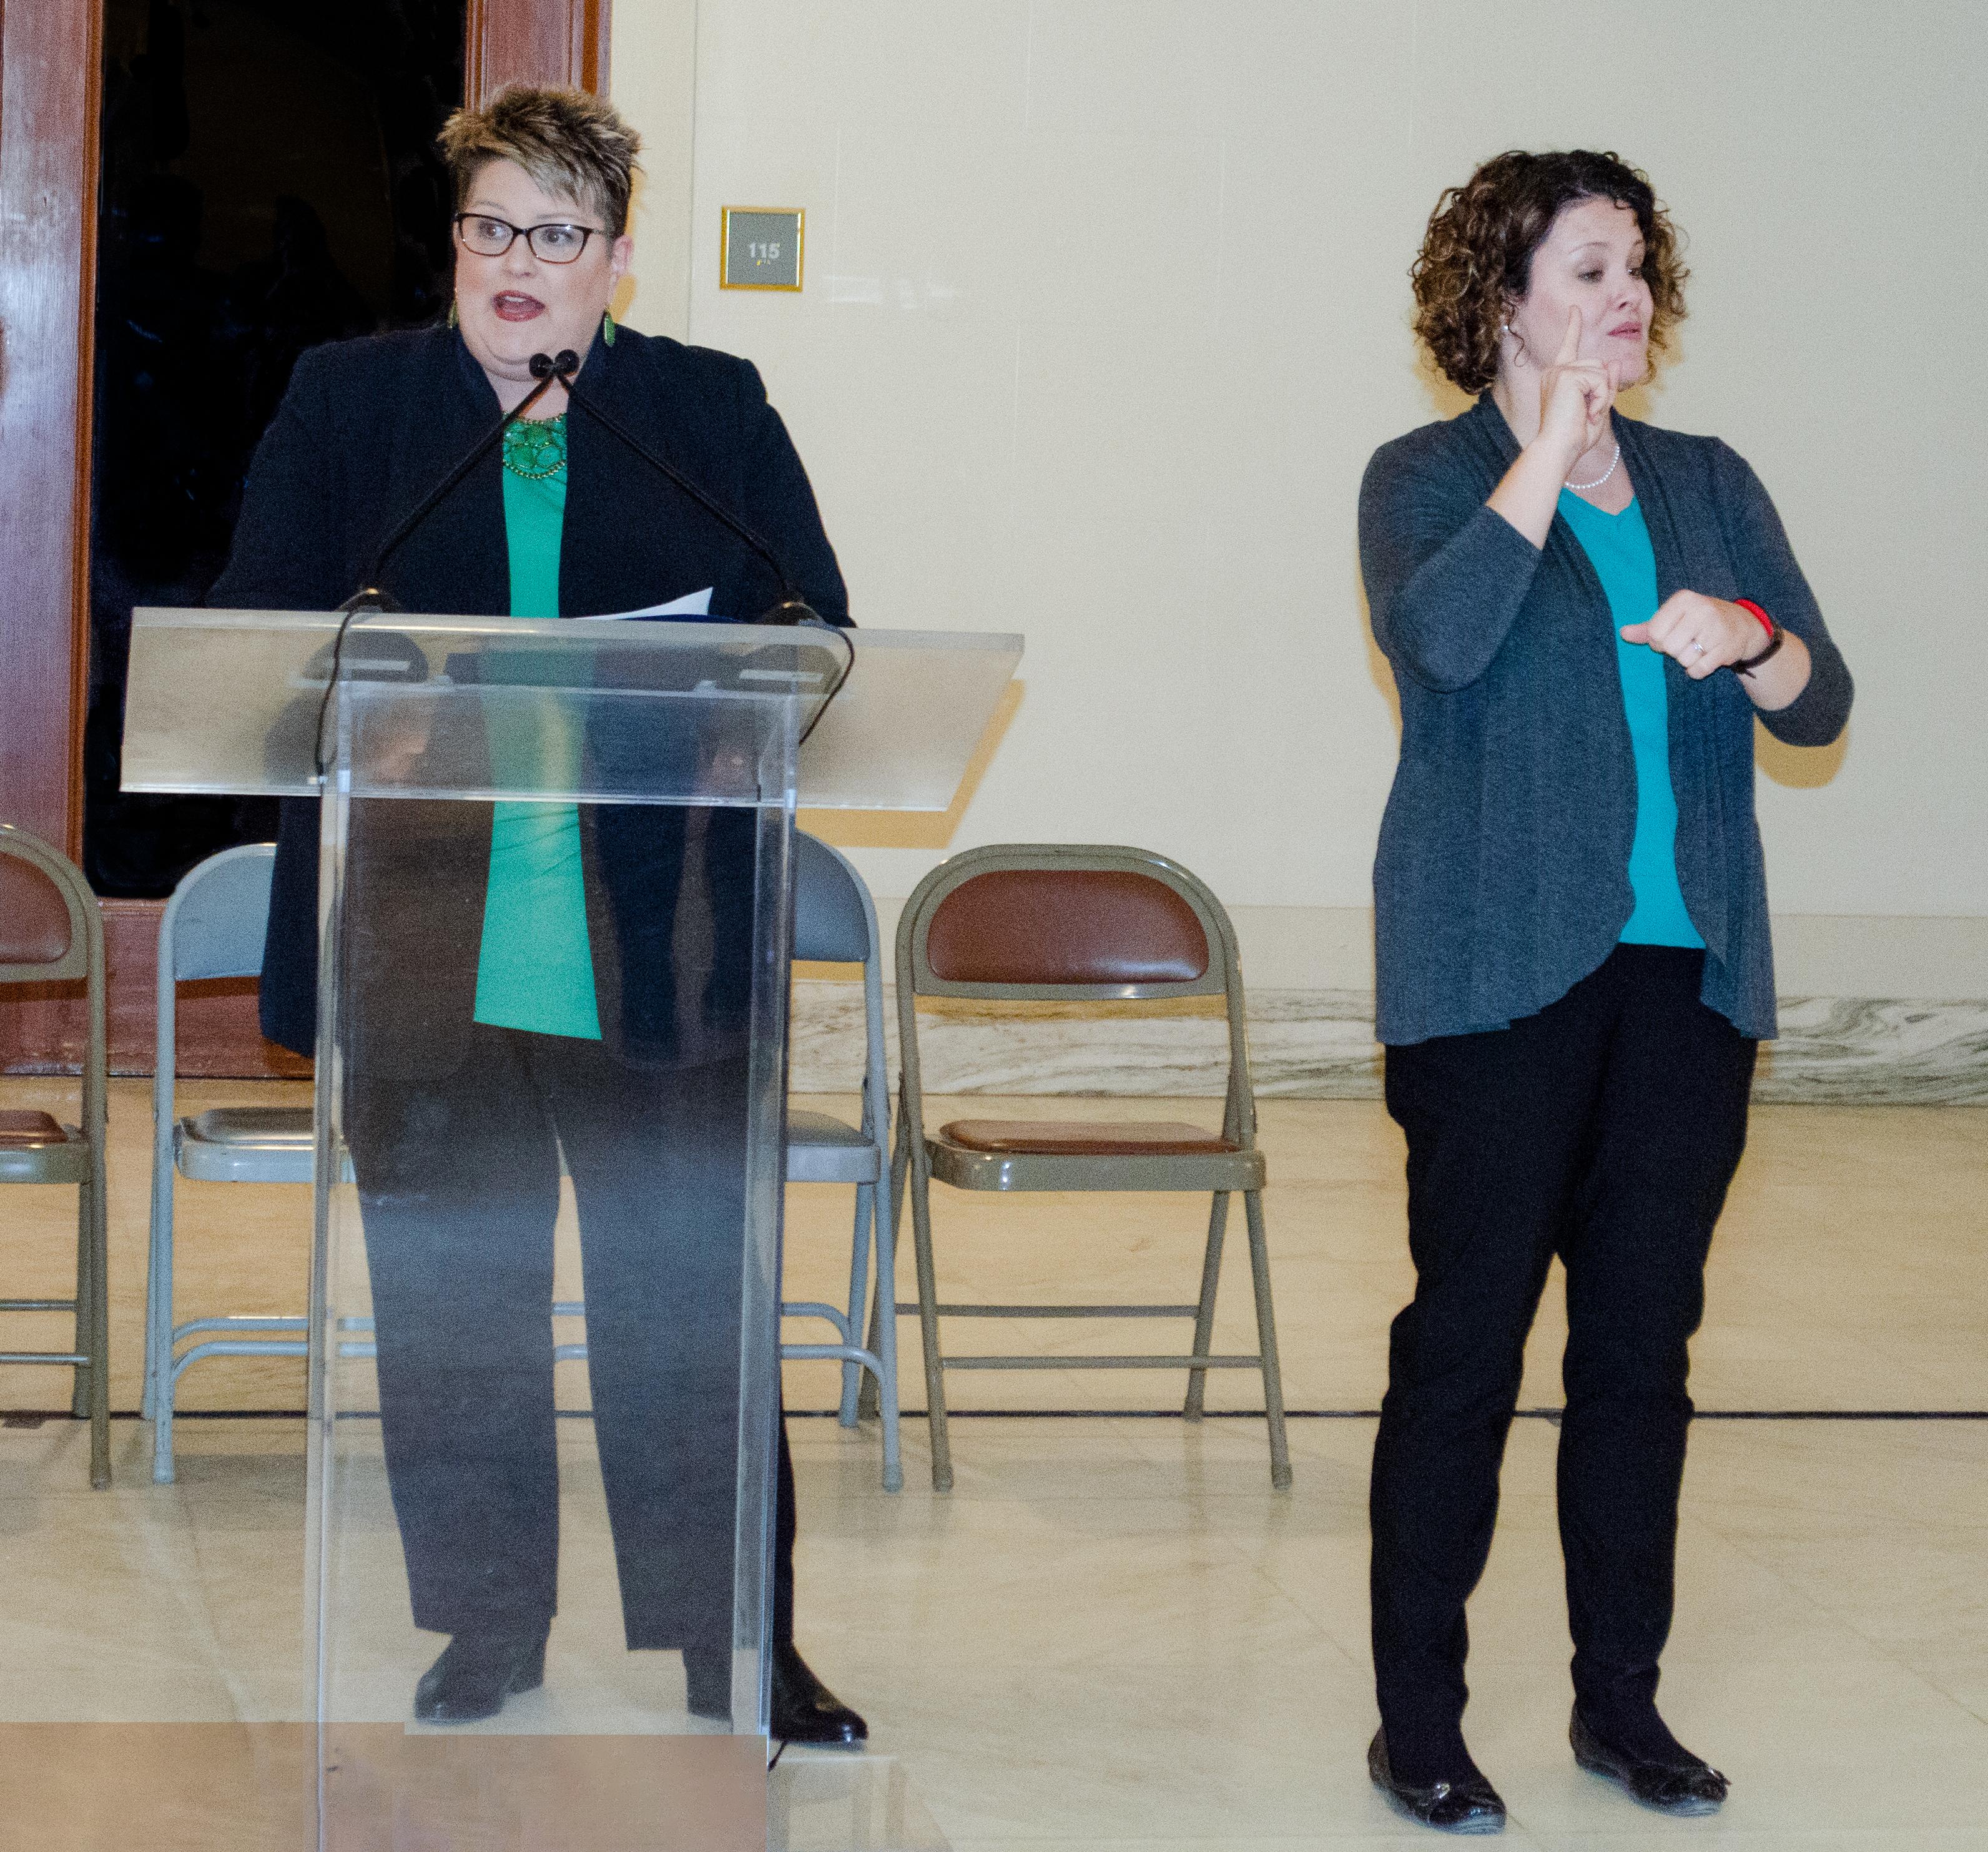 A sign language interpreter signs for Director Fruendt at an event.